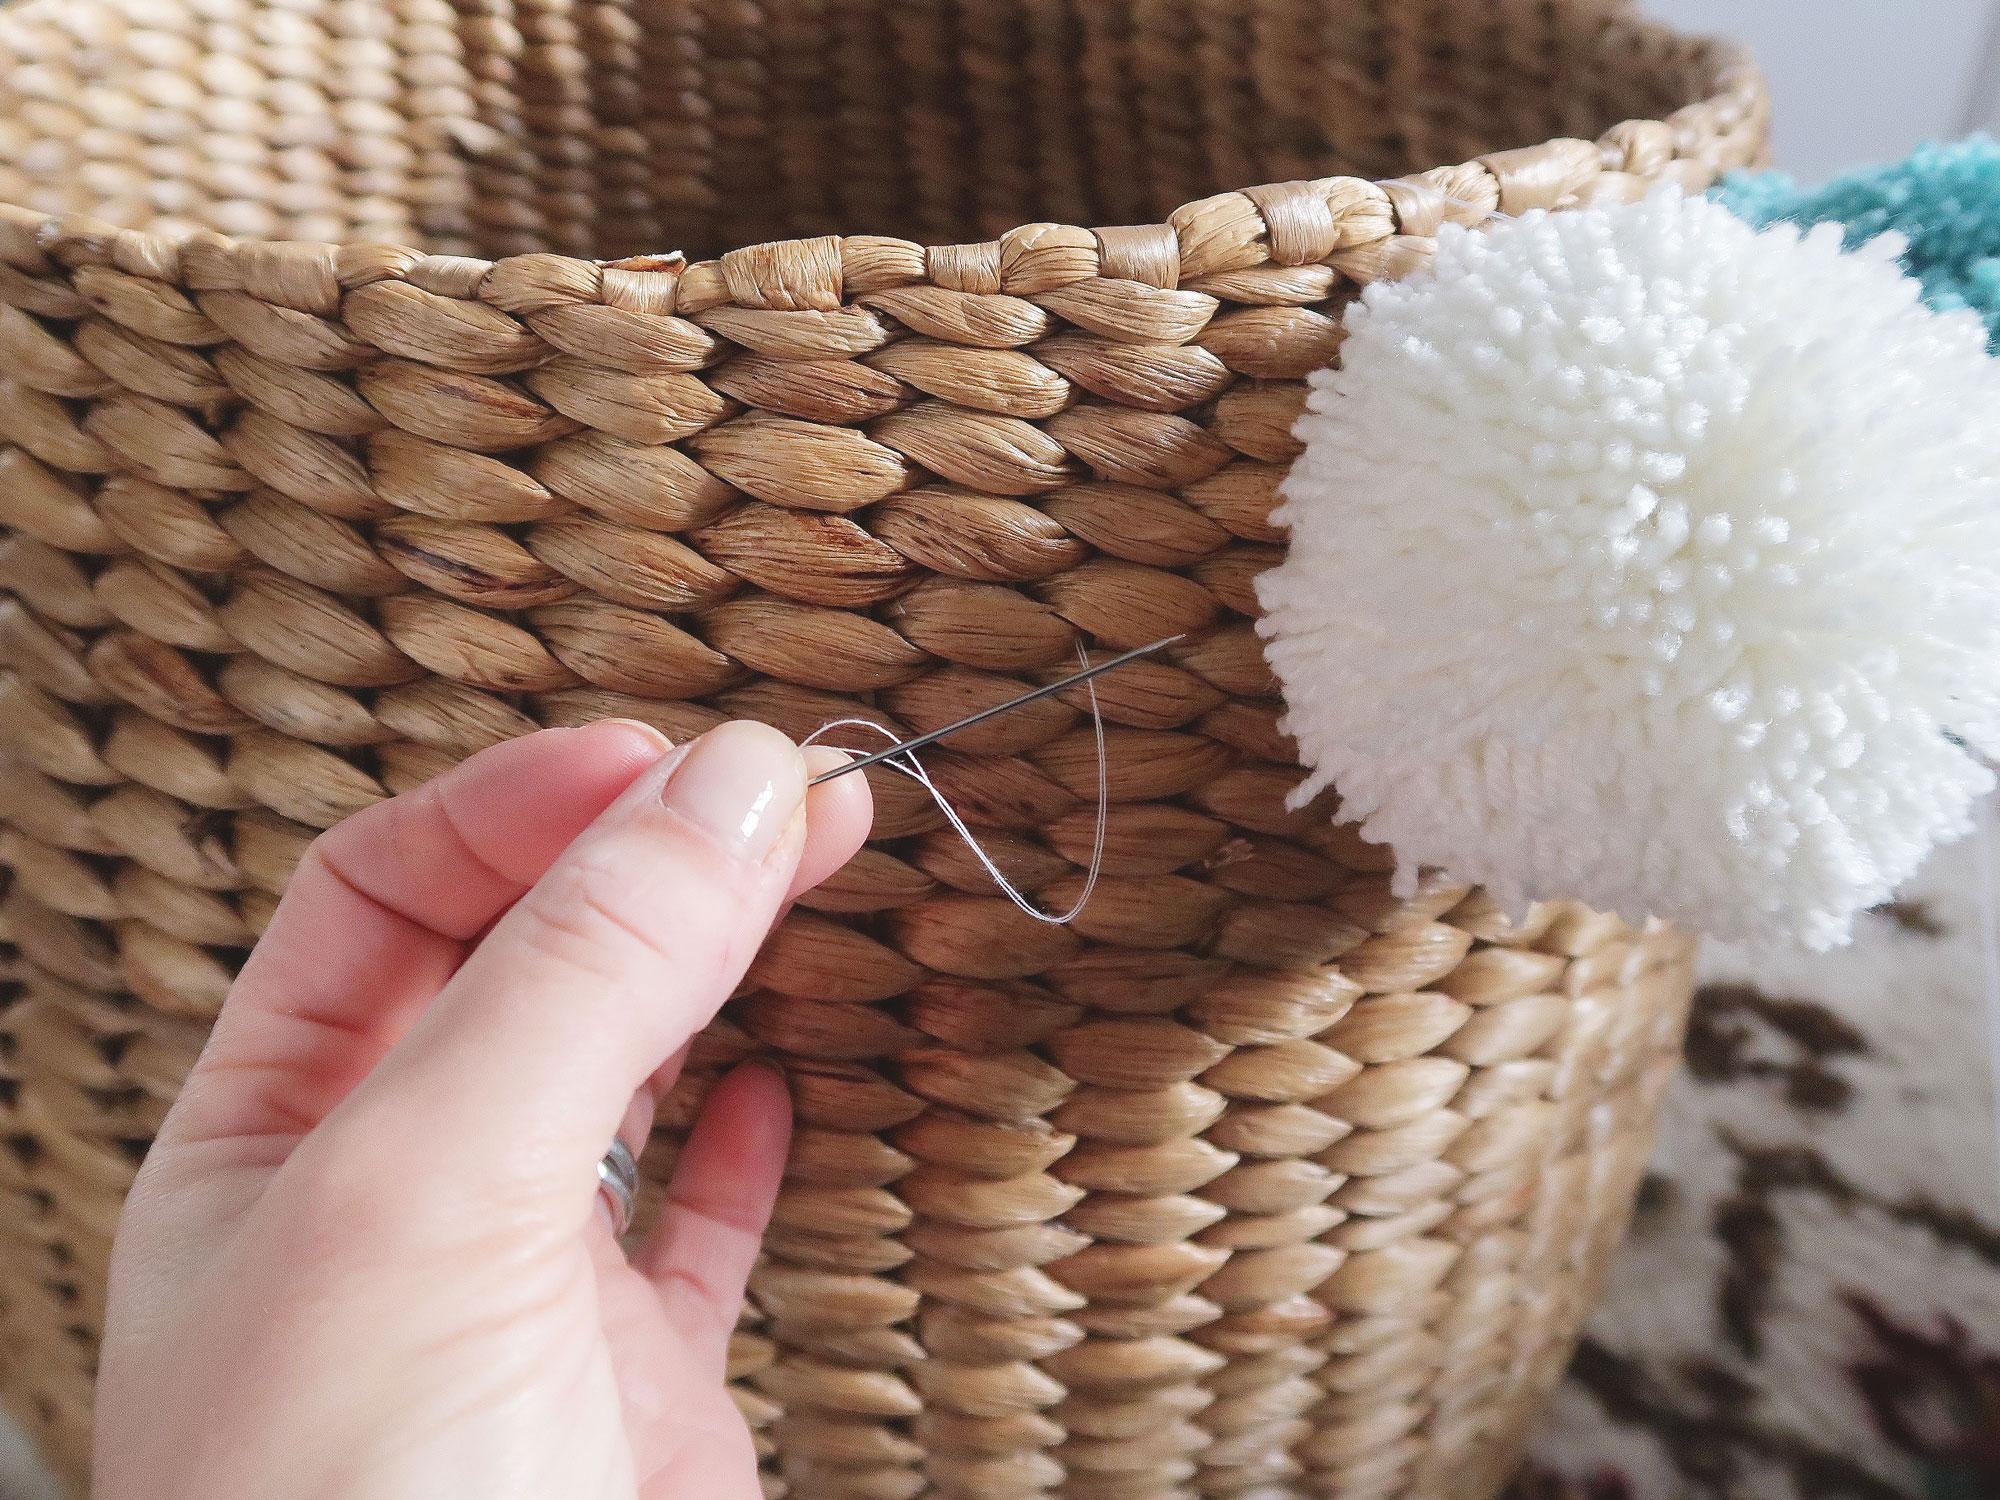 pom_pom_making_sewing_the_basket